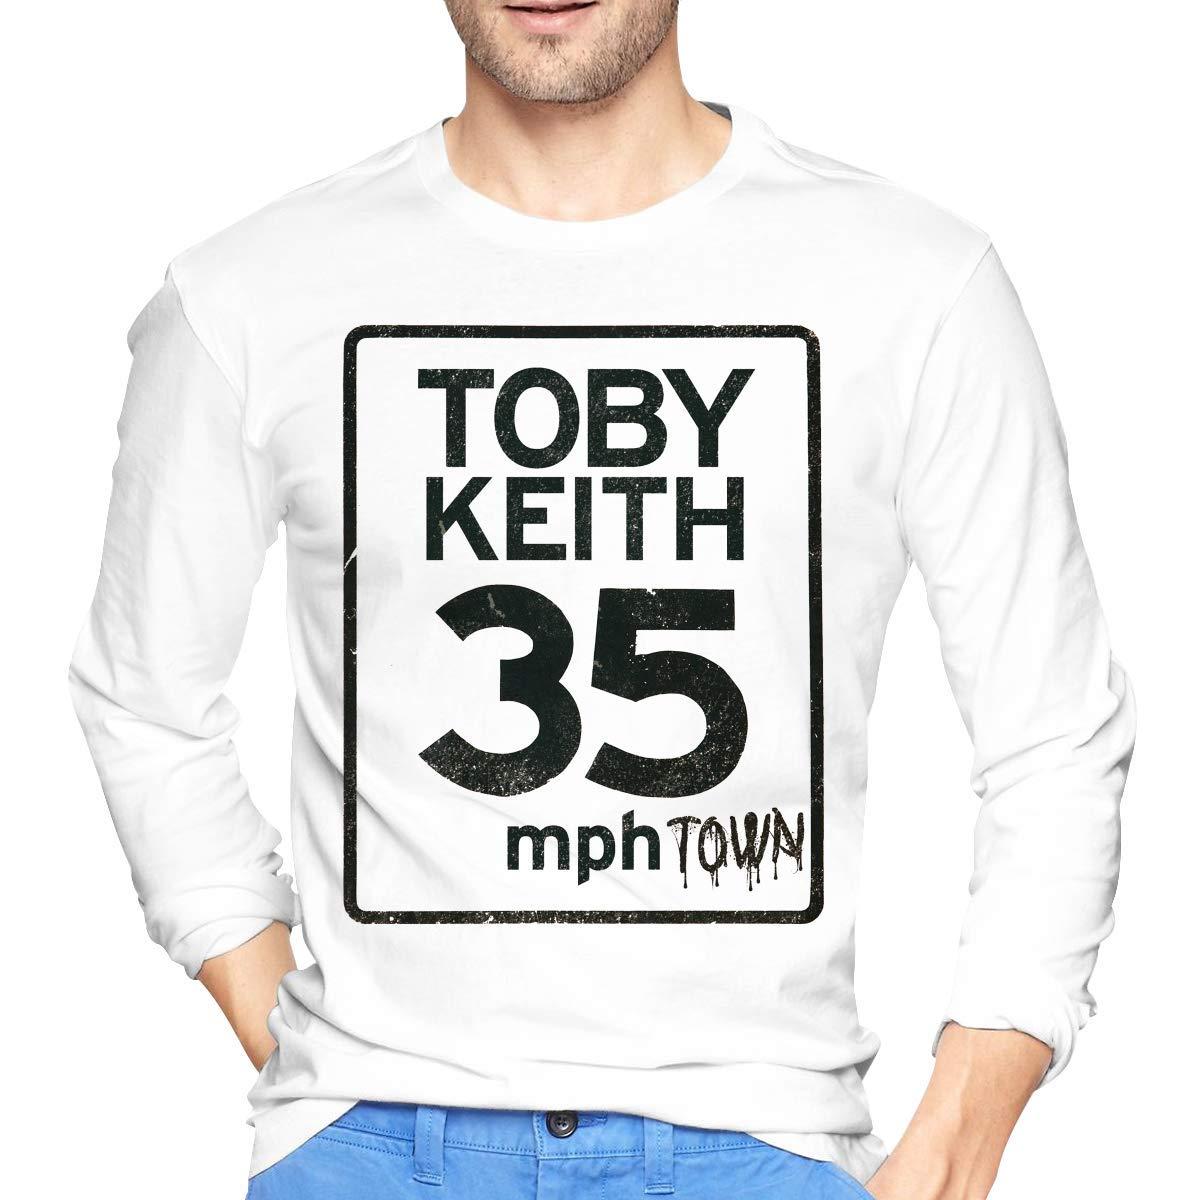 Fssatung S Toby Keith 35 Mph Town T Shirt